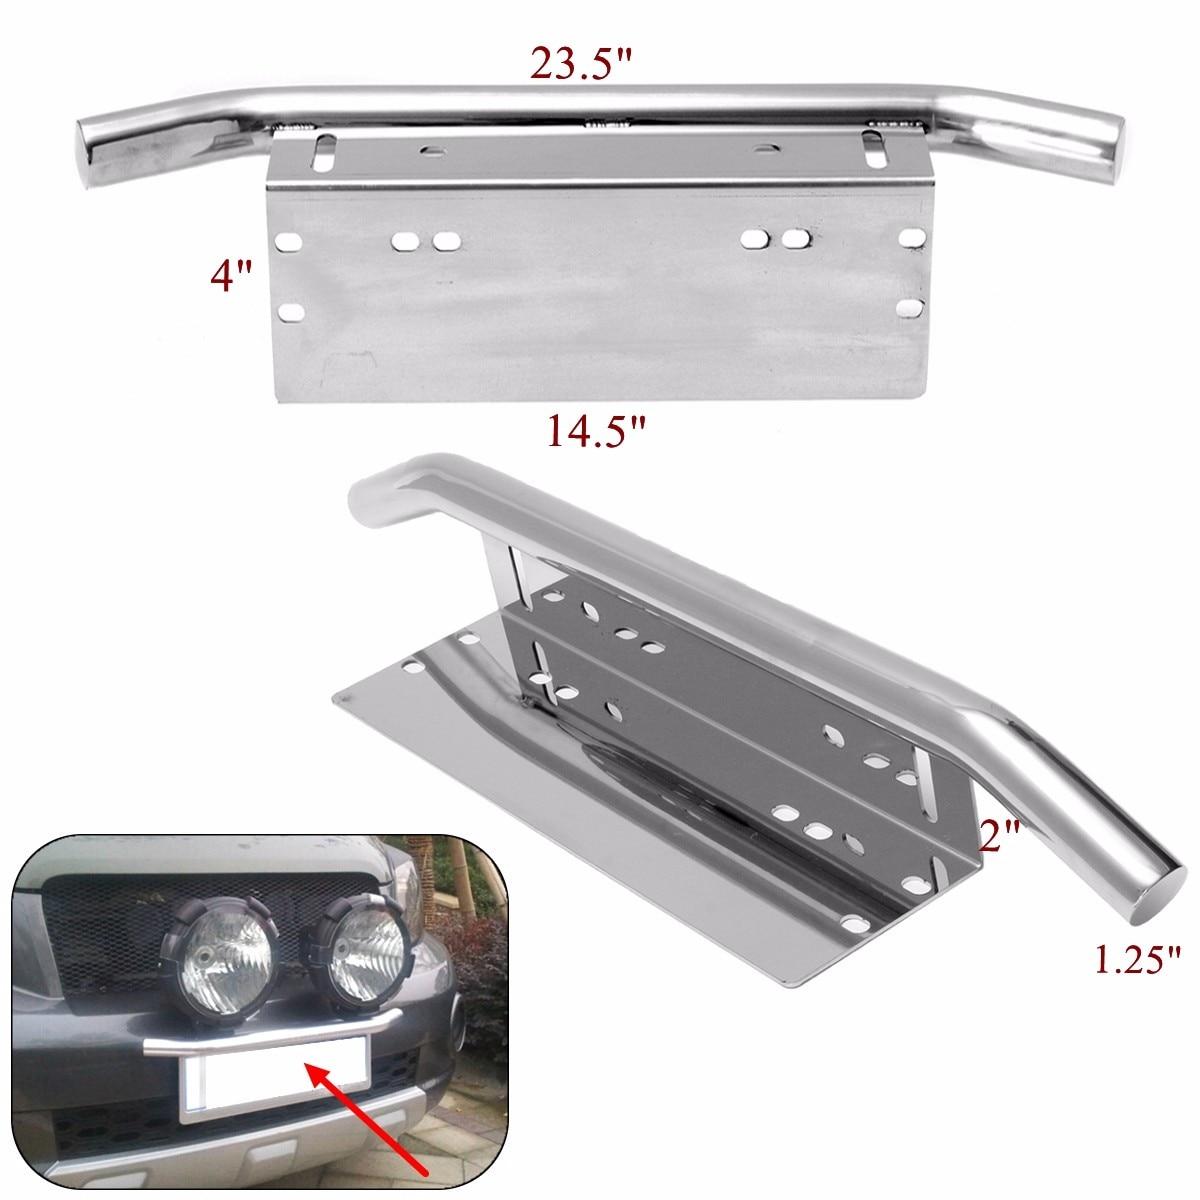 23inch Unversal Bull Bar Front Bumper Fog Working Lights License Plate Mount Braket Holder Offroad Light Bar